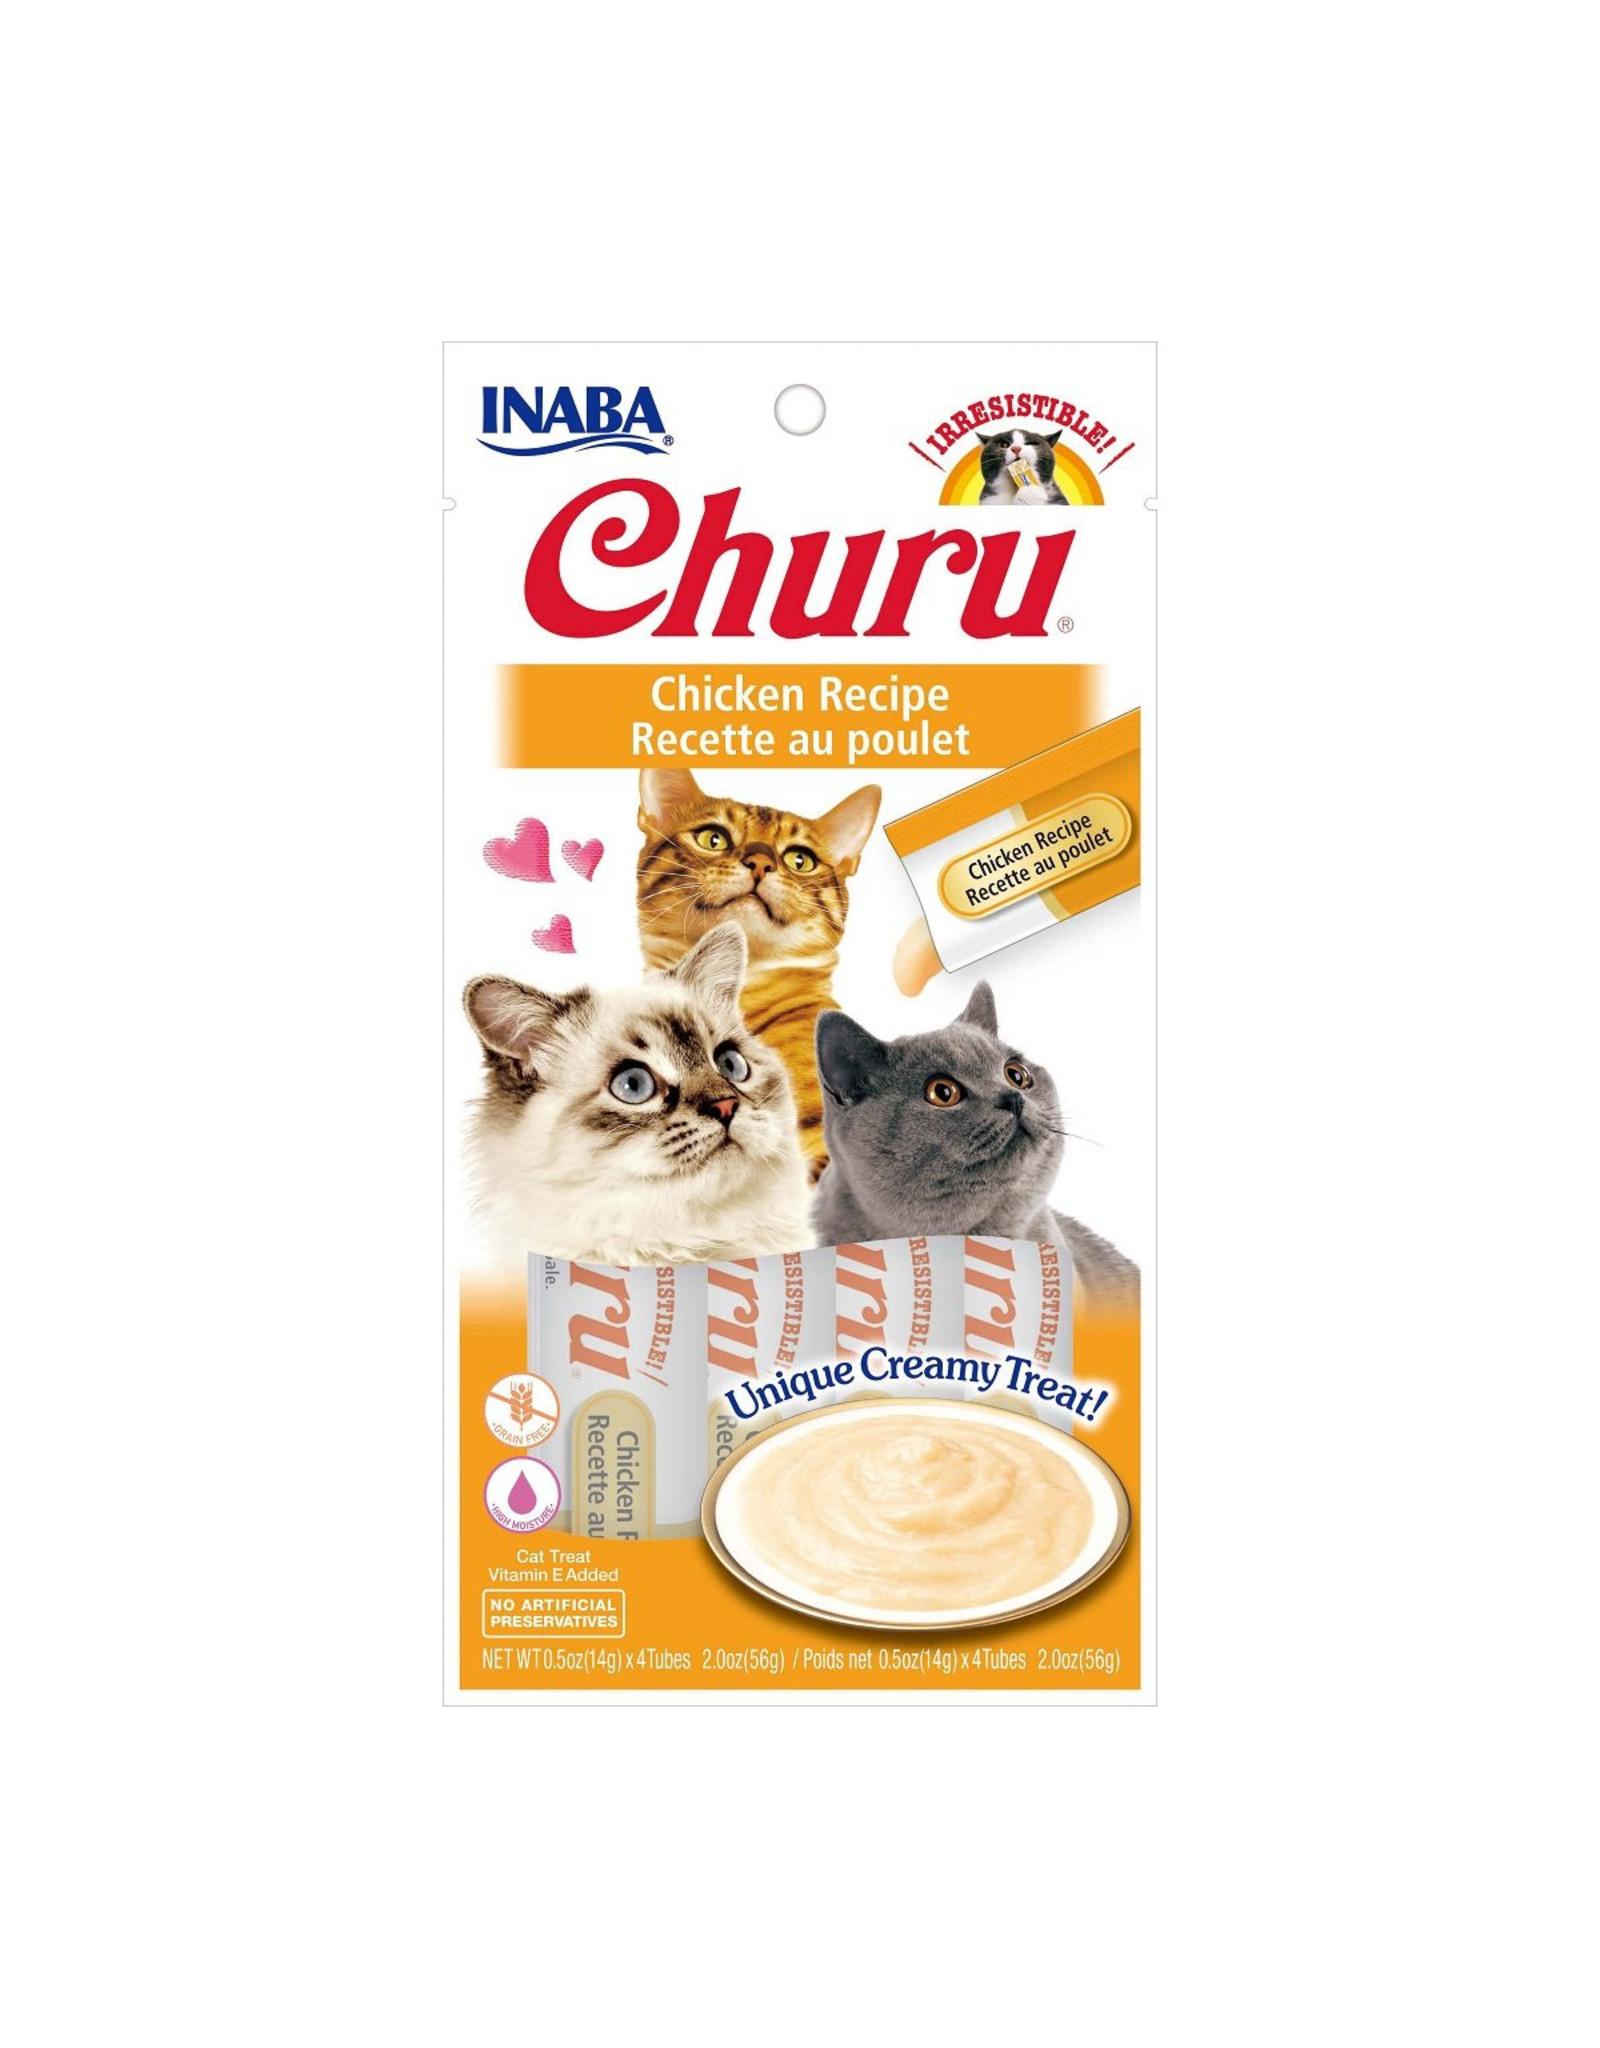 Inaba Inaba Churu Purees Chicken Recipe 4 tube pack